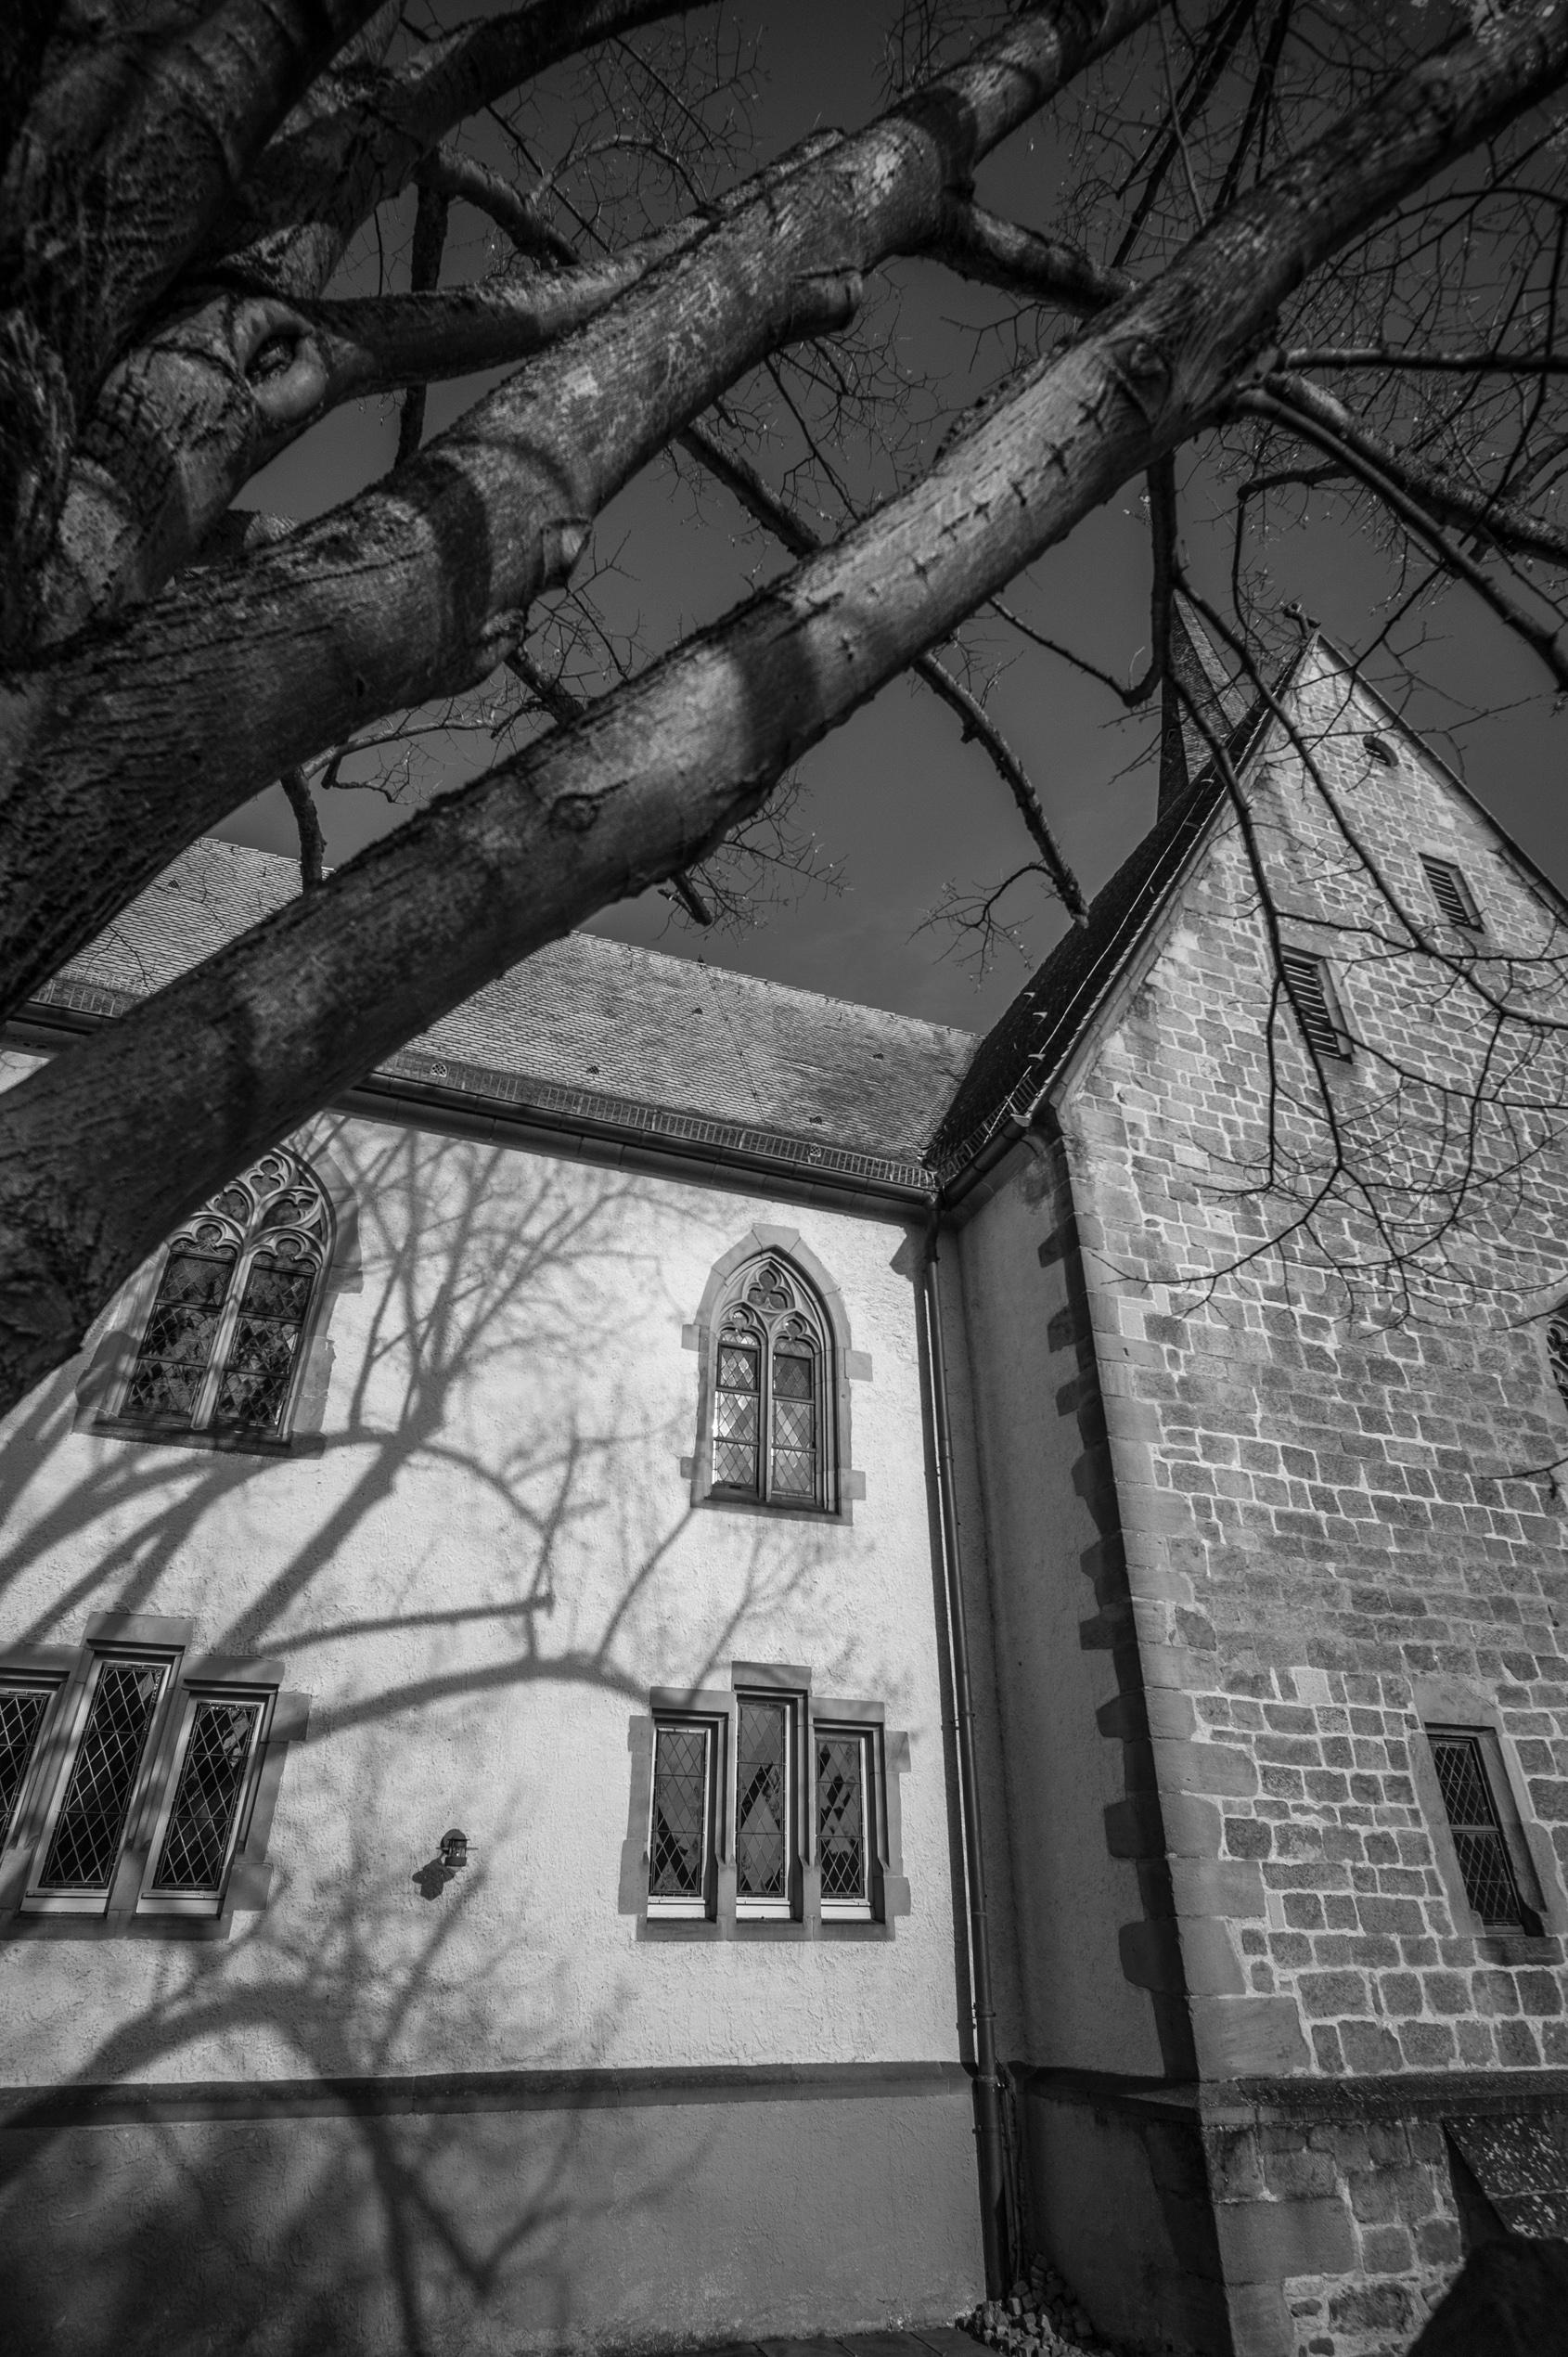 KirchenImDekanat-1000955 by .